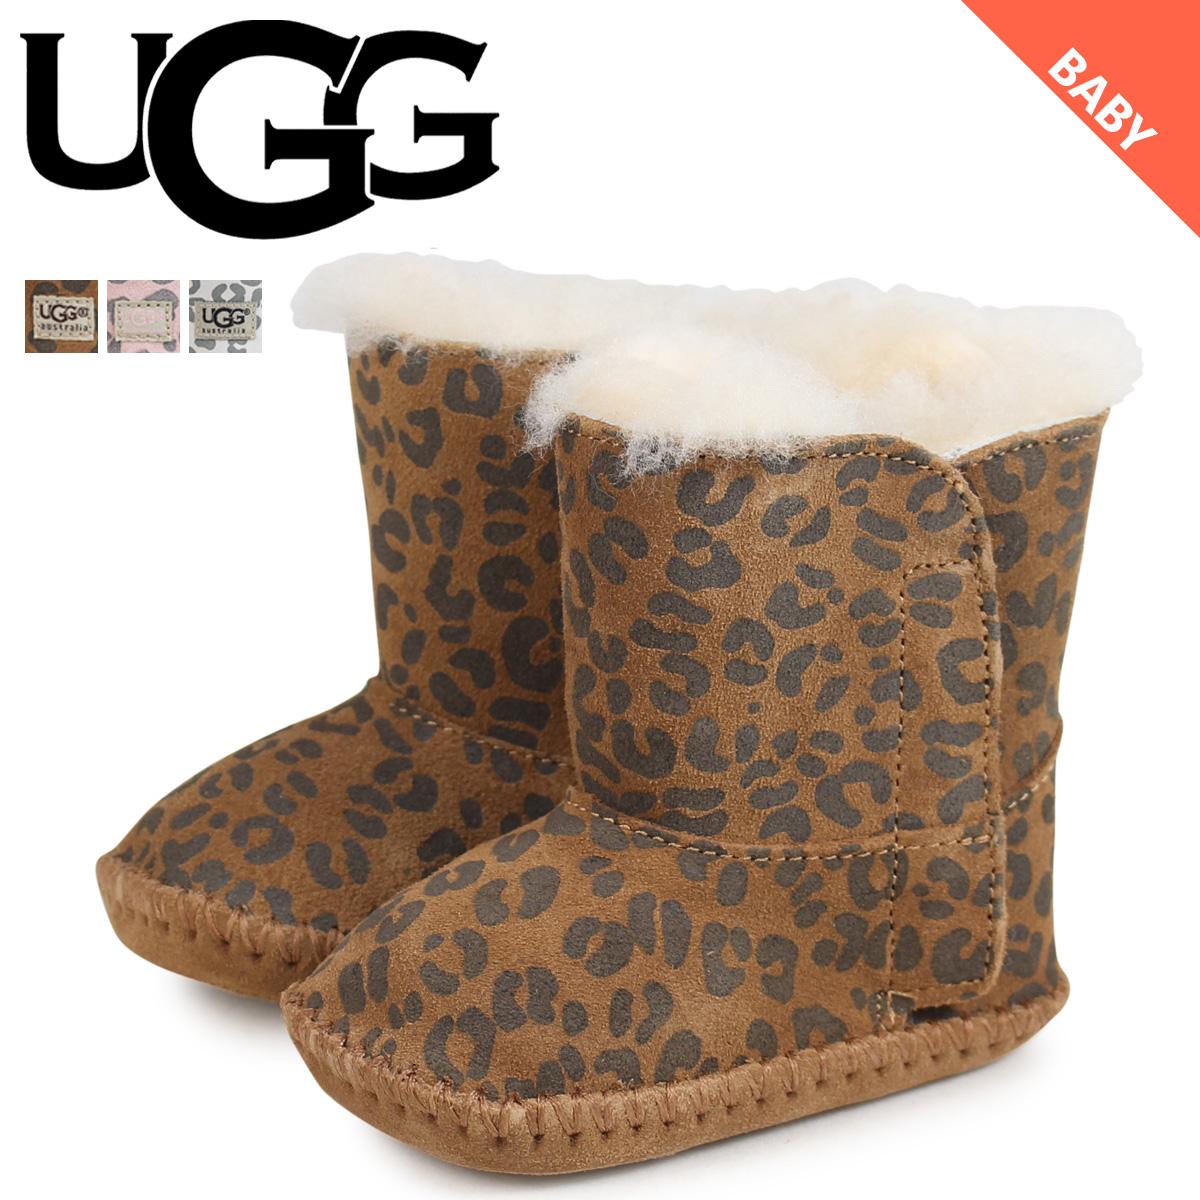 UGG アグ ムートンブーツ ベビー キッズ カシー INFANTS CASSIE LEOPARD 1001781 シープスキン レオパード ベビー靴